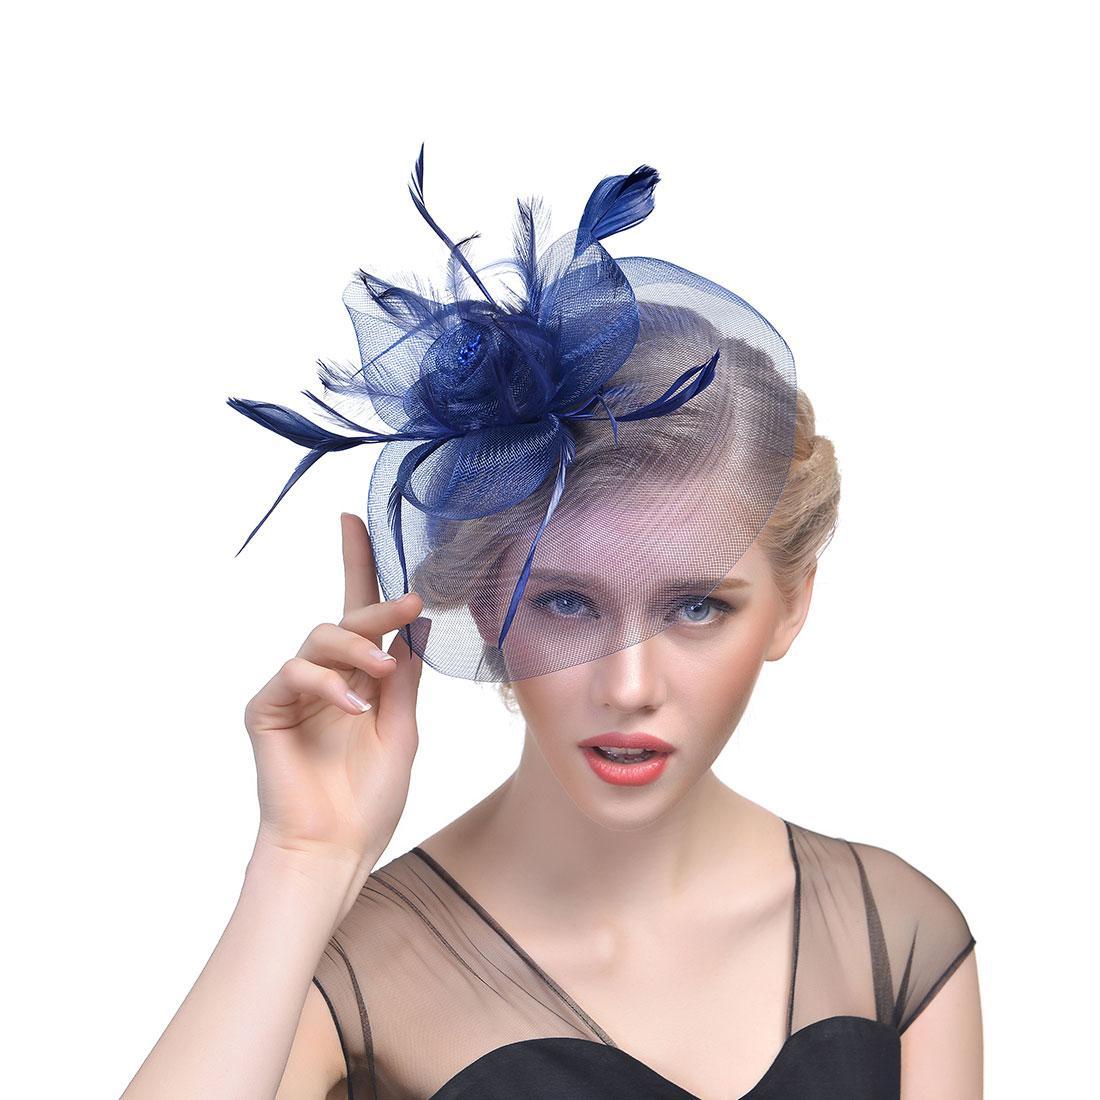 7cb978007a2bd Vintage Bridal Hats Feather Headdress Flower Fascinator Great Gatsby Bridal  Headwear For Wedding Party Black Navy White Blue Wedding Hat Bridal Shower  Hat ...